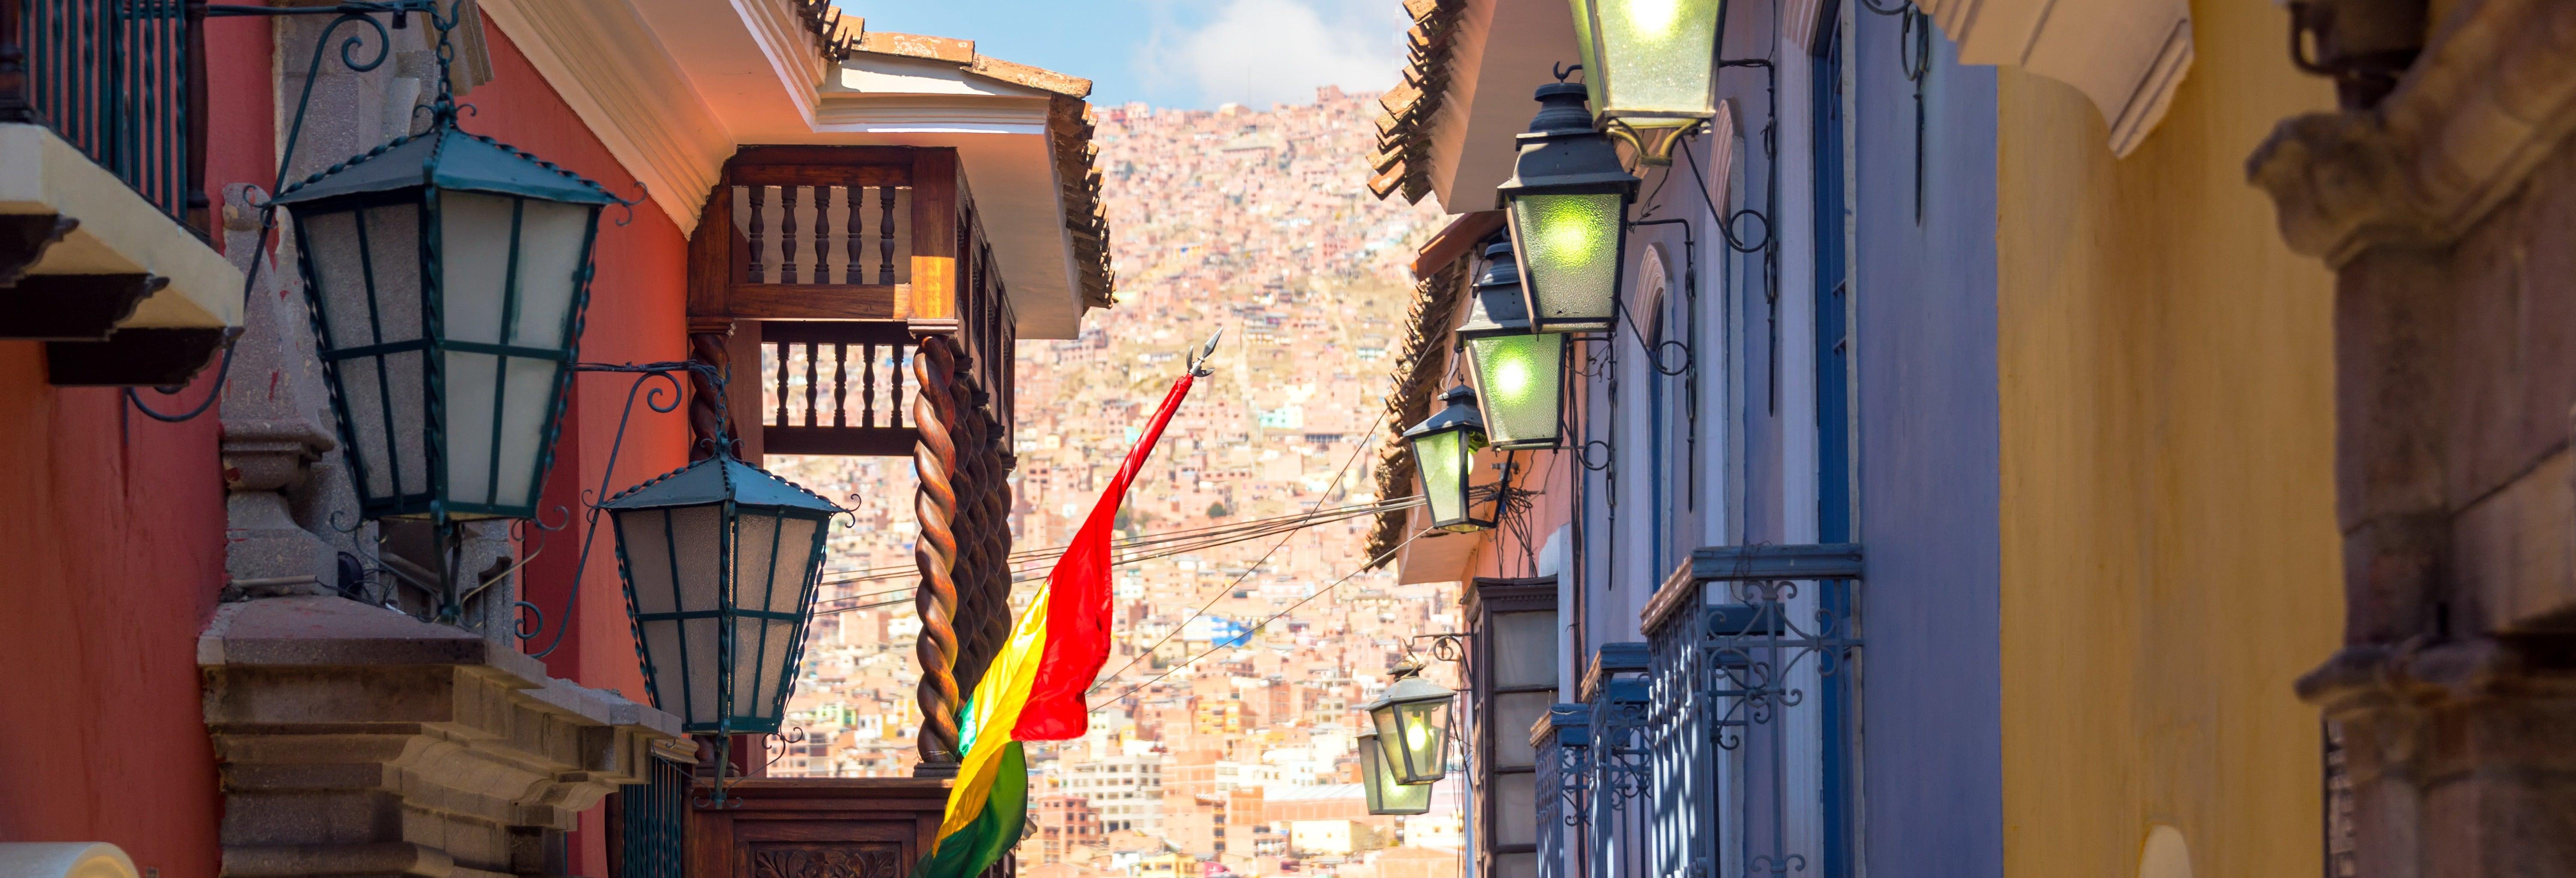 Tour alternativo por La Paz